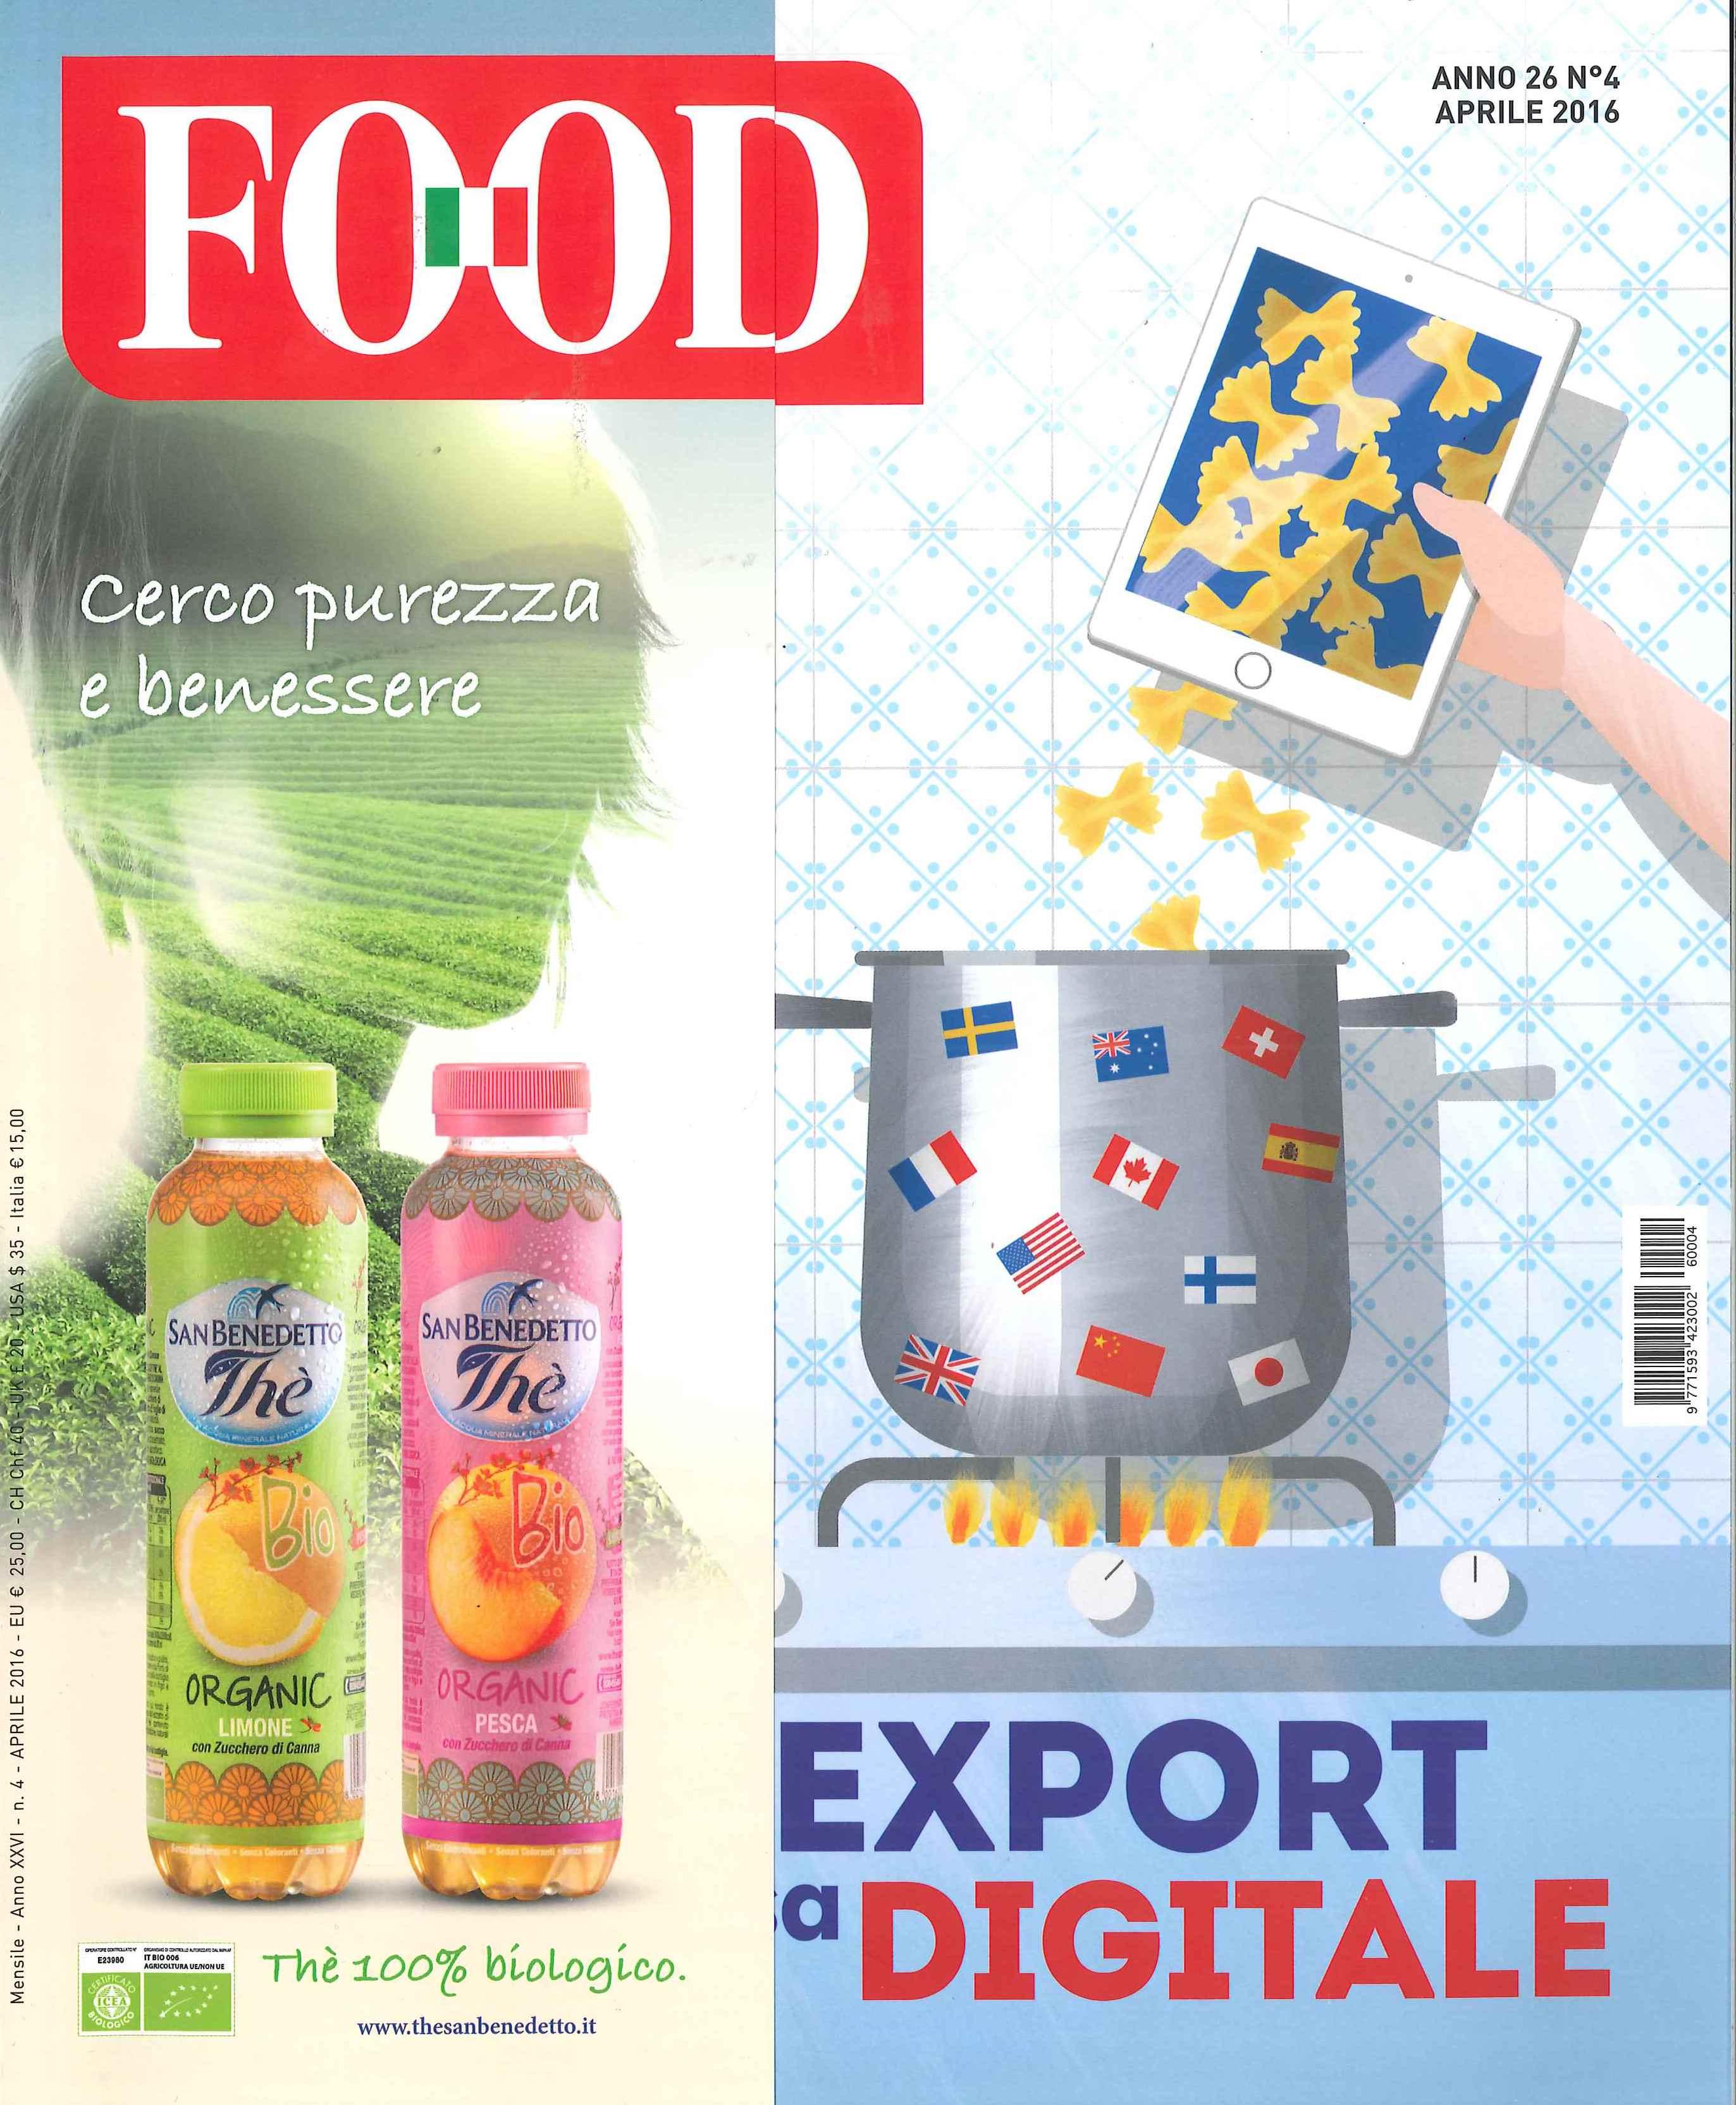 01.04.2016_Food_Pagina_1